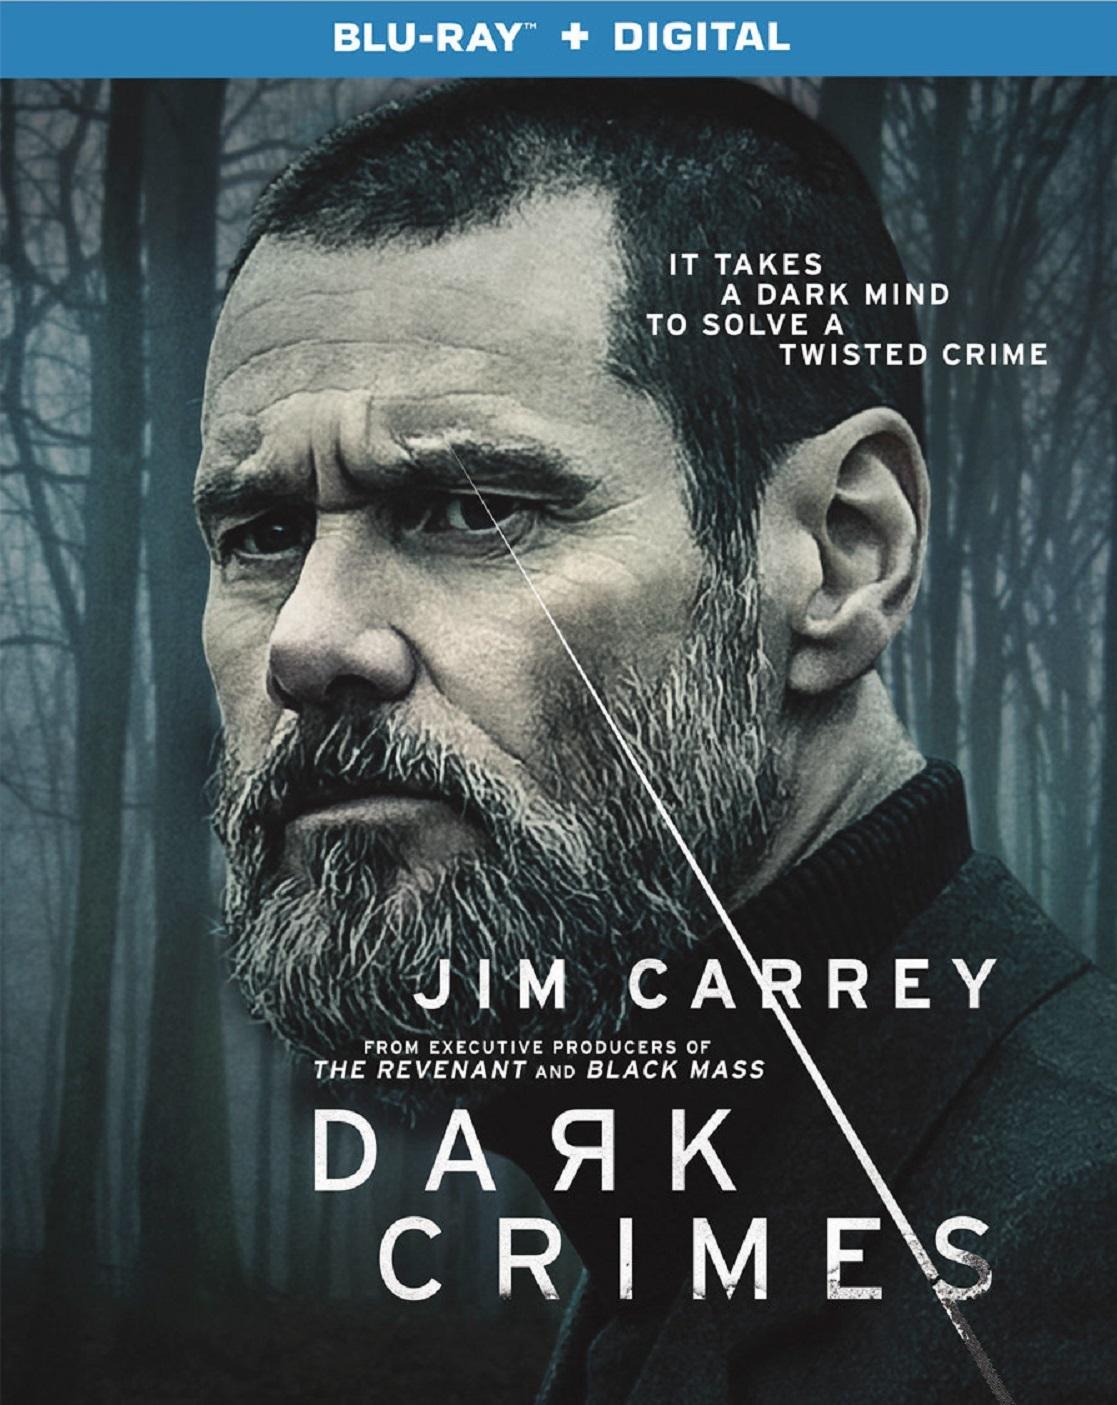 Dark Crimes (2018) Blu-ray